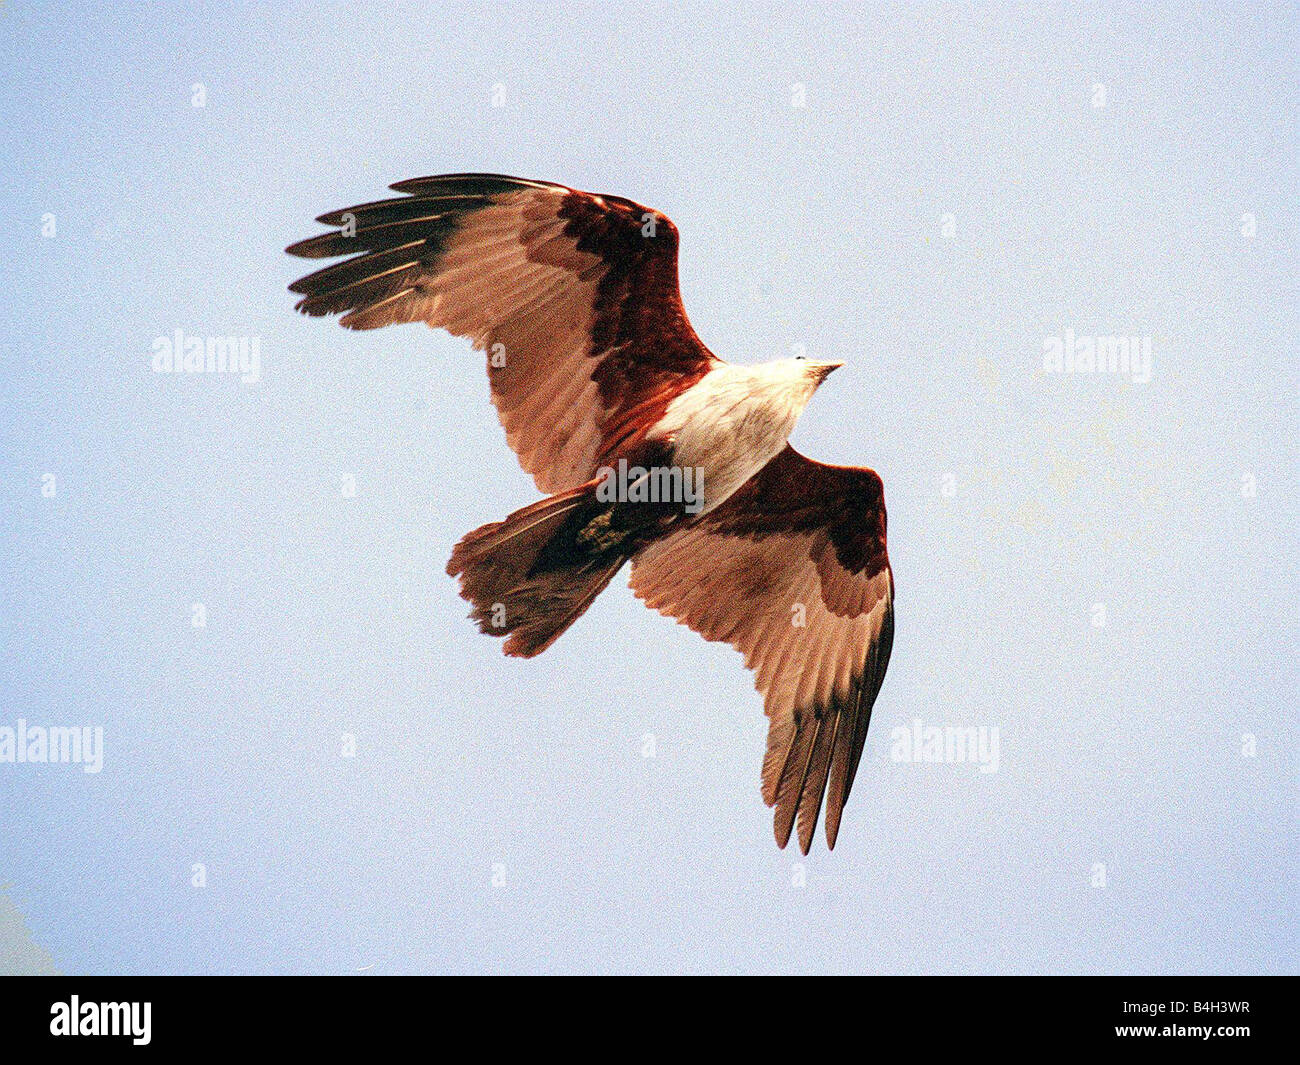 Birds Bird of Prey Kite Brumney Kite February 2002 - Stock Image